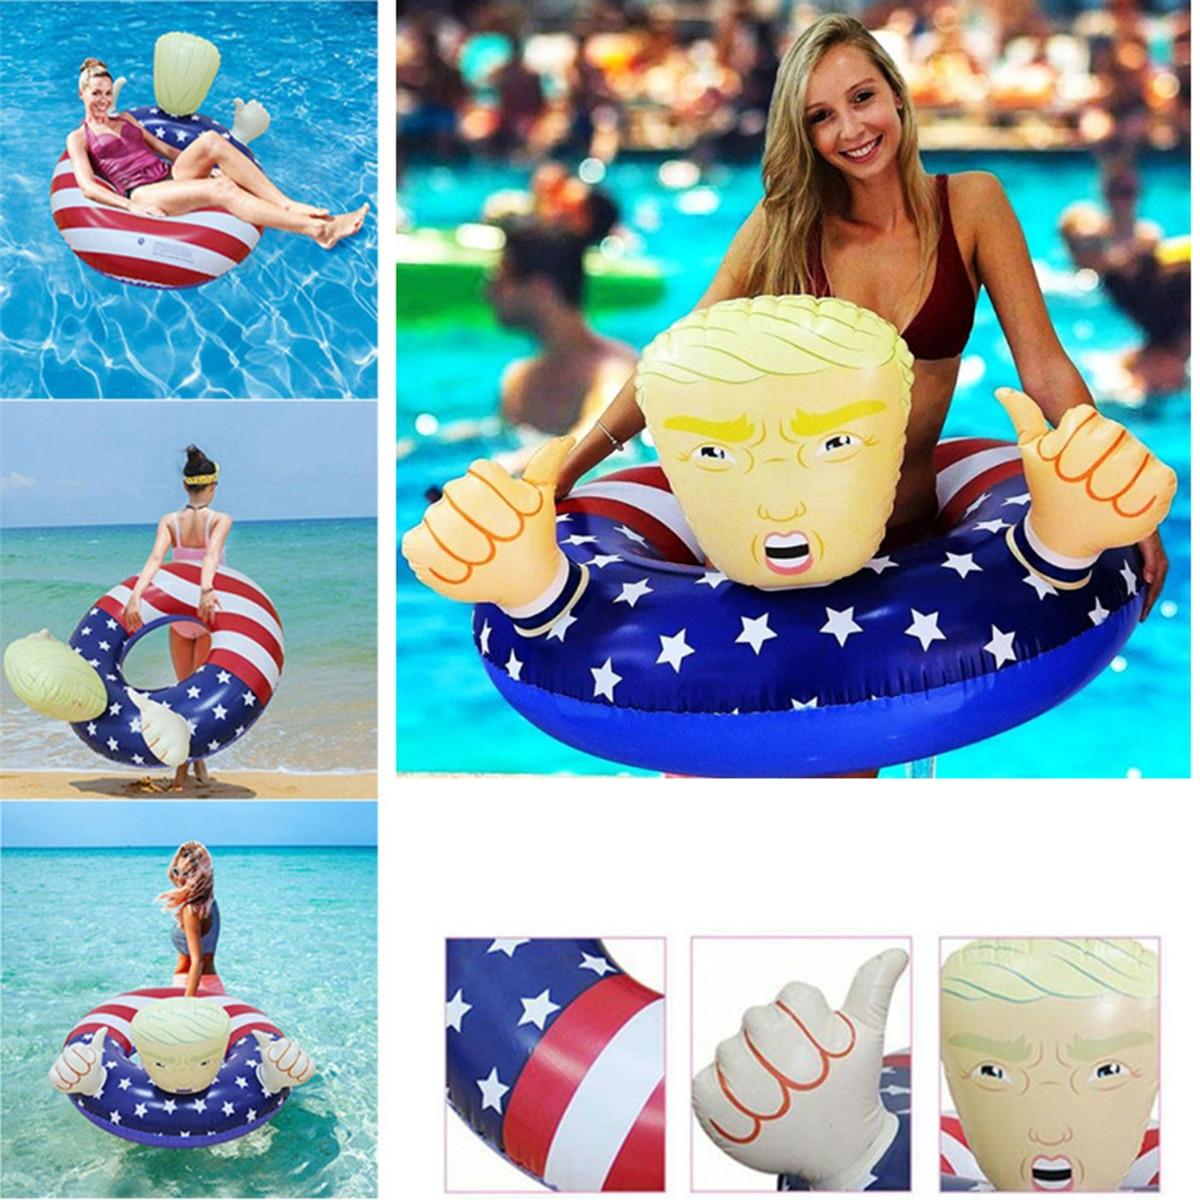 Flotador de piscina, nuevo y creativo flotador de piscina, bandera estadounidense Donald Trump, flotadores inflables de piscina para adultos